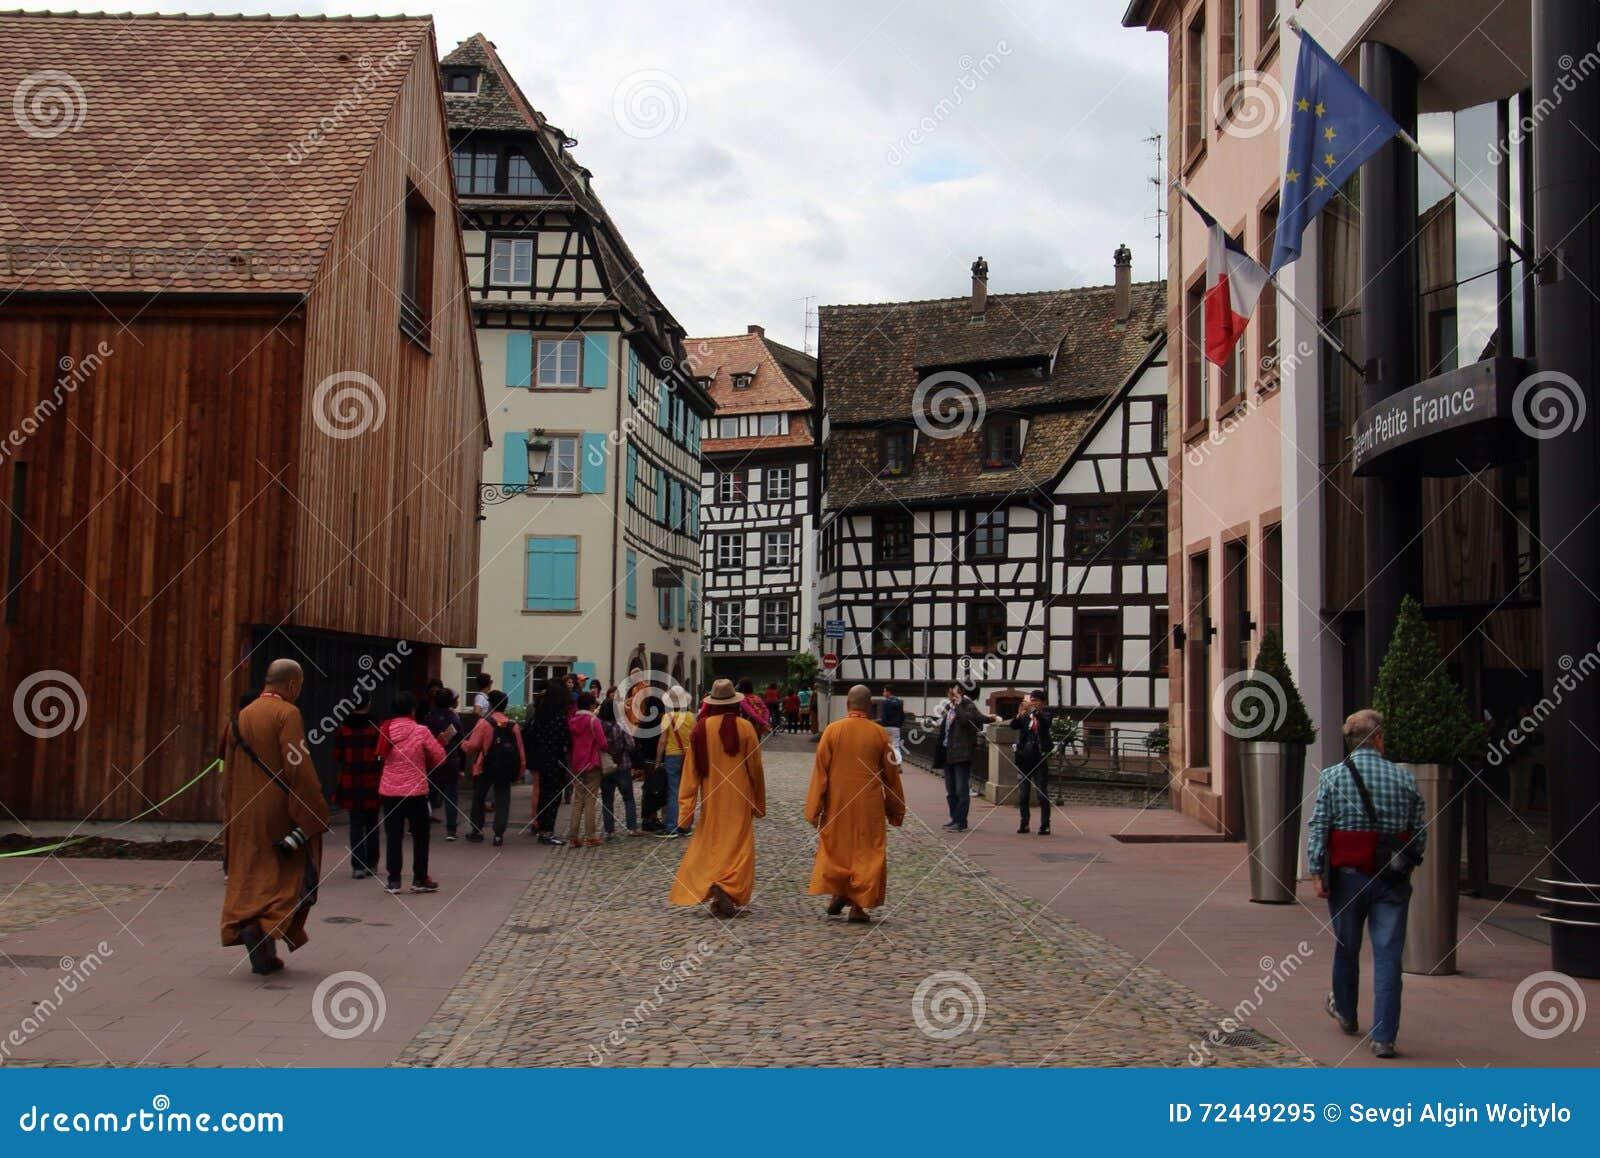 Holidays in Strasbourg France